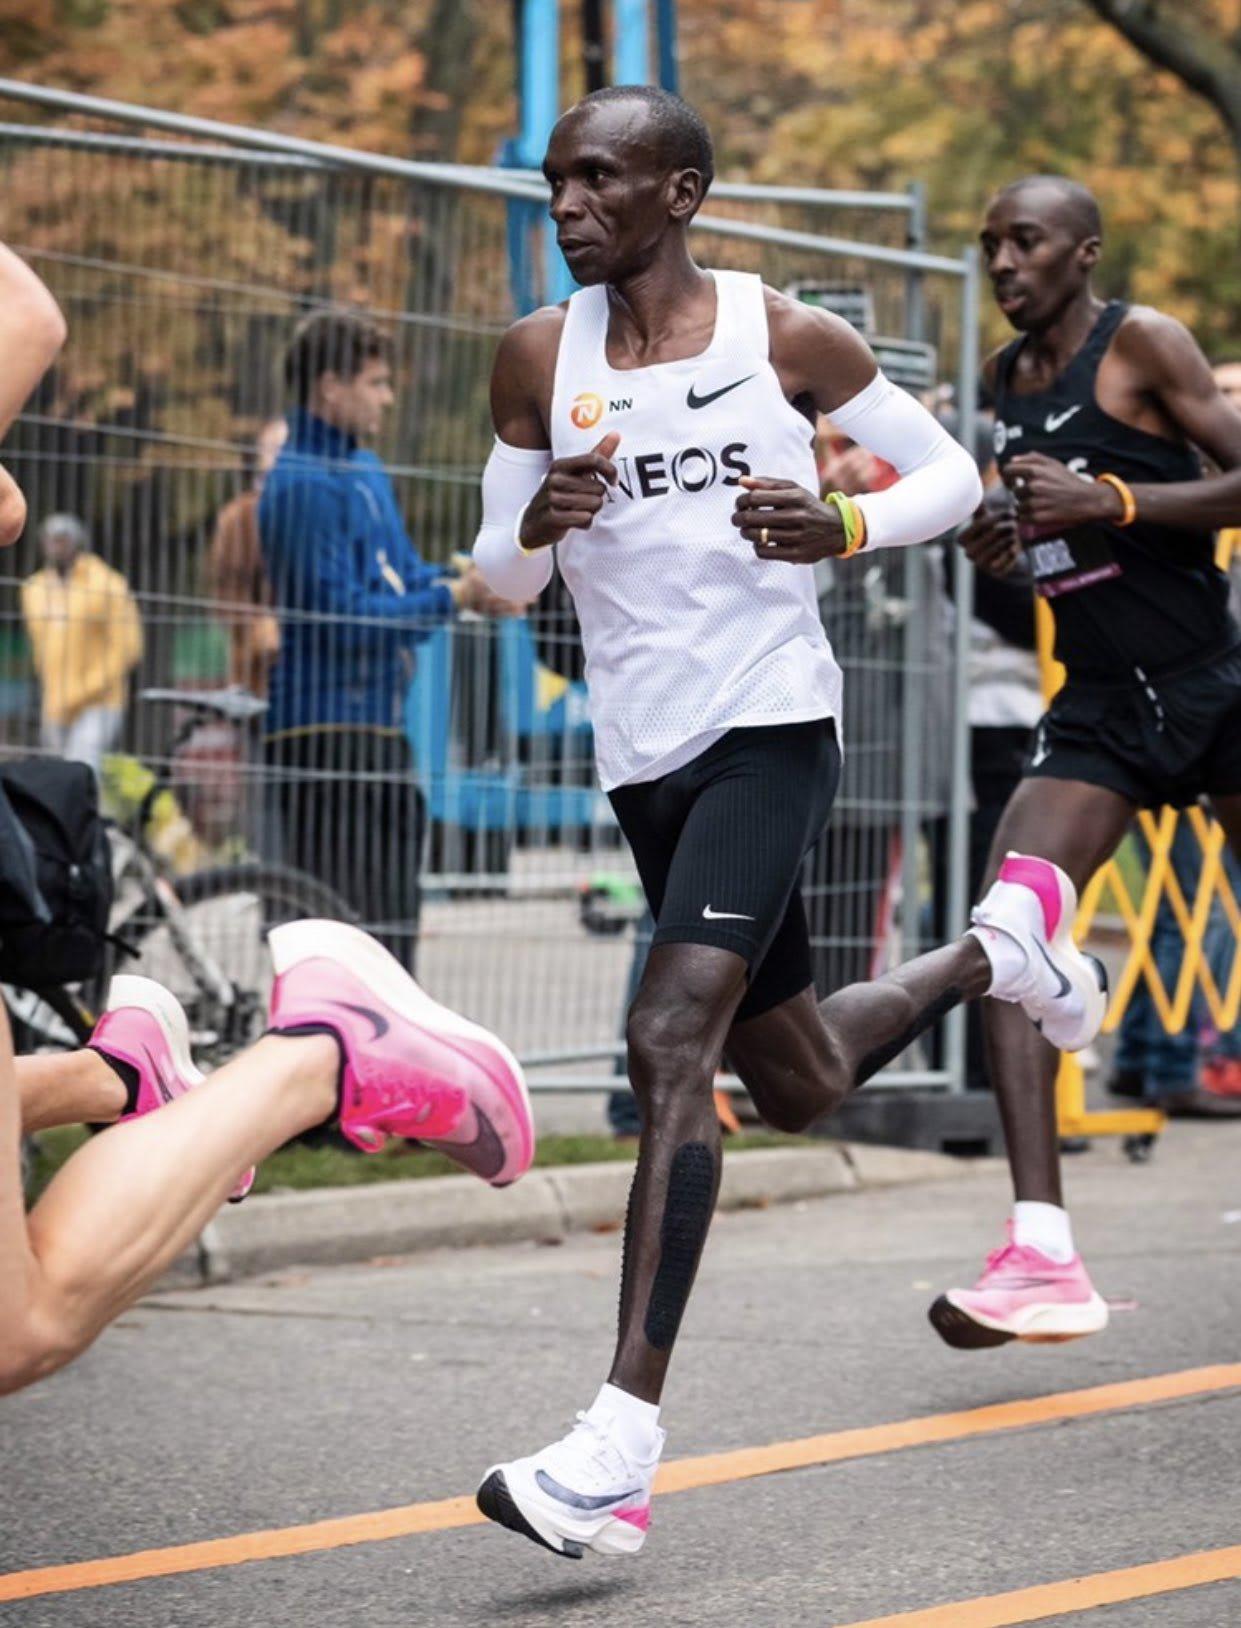 Eliud Kipchoge Runs Sub 2-Hour Marathon in Nike Next%